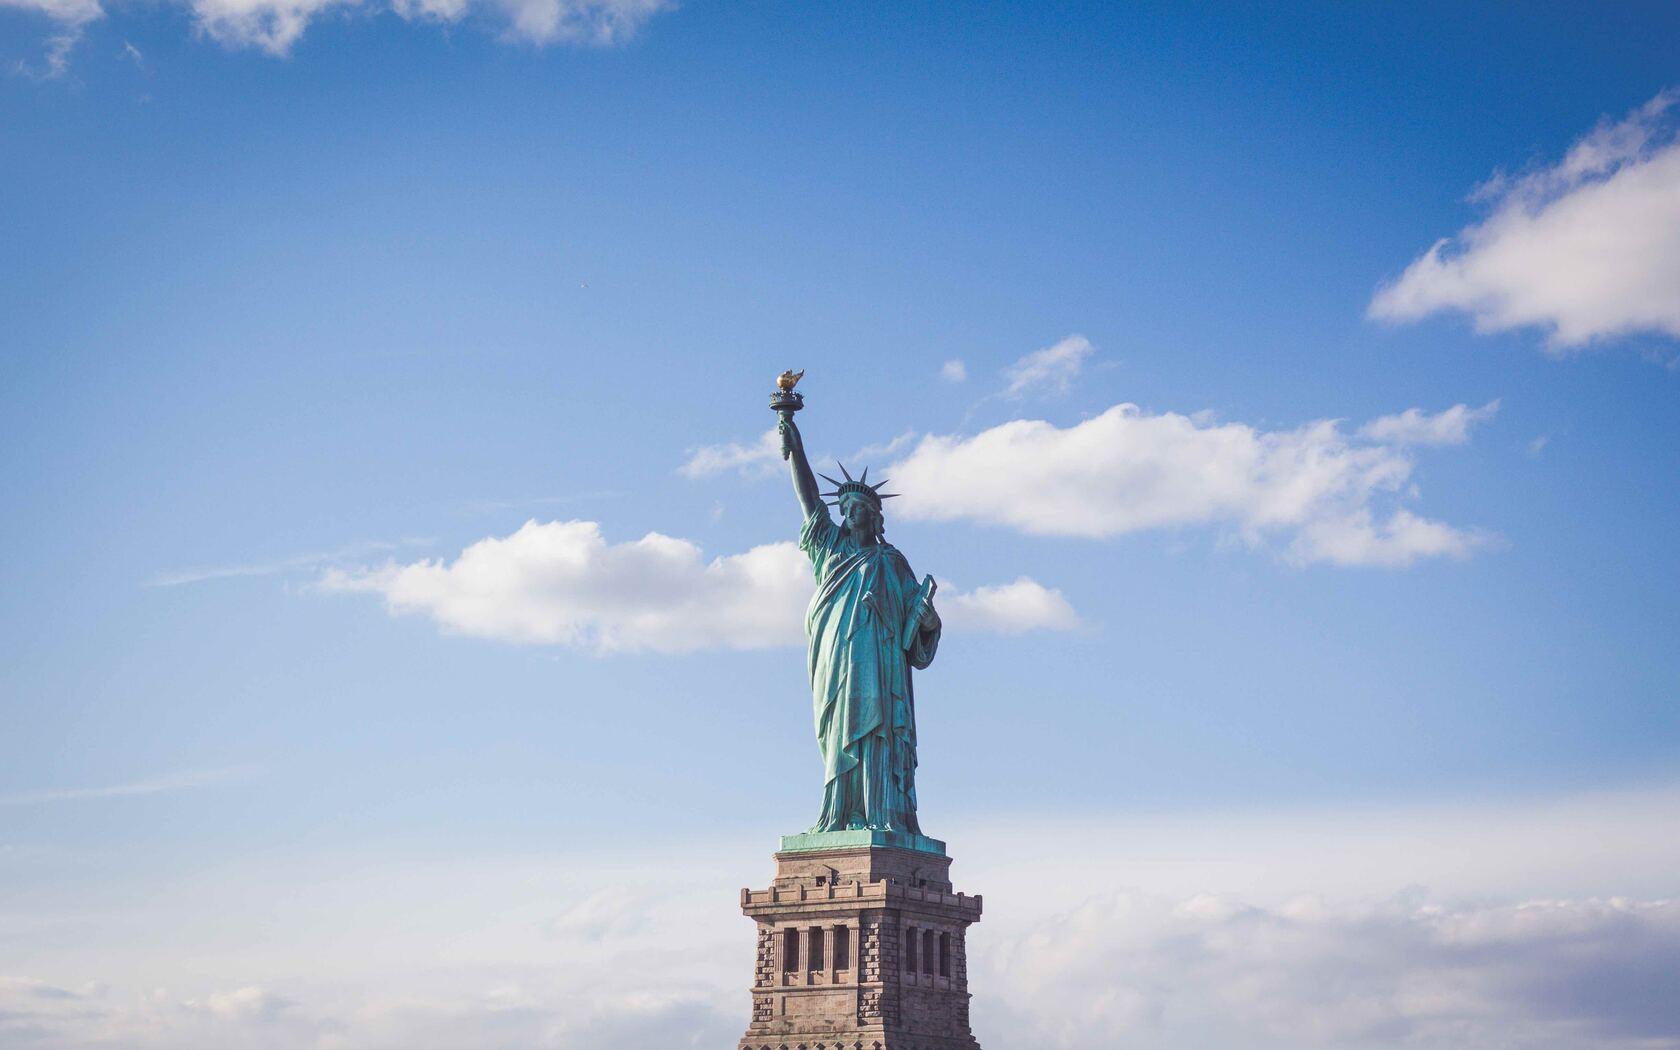 1680x1050 Statue Of Liberty 1680x1050 Resolution Hd 4k